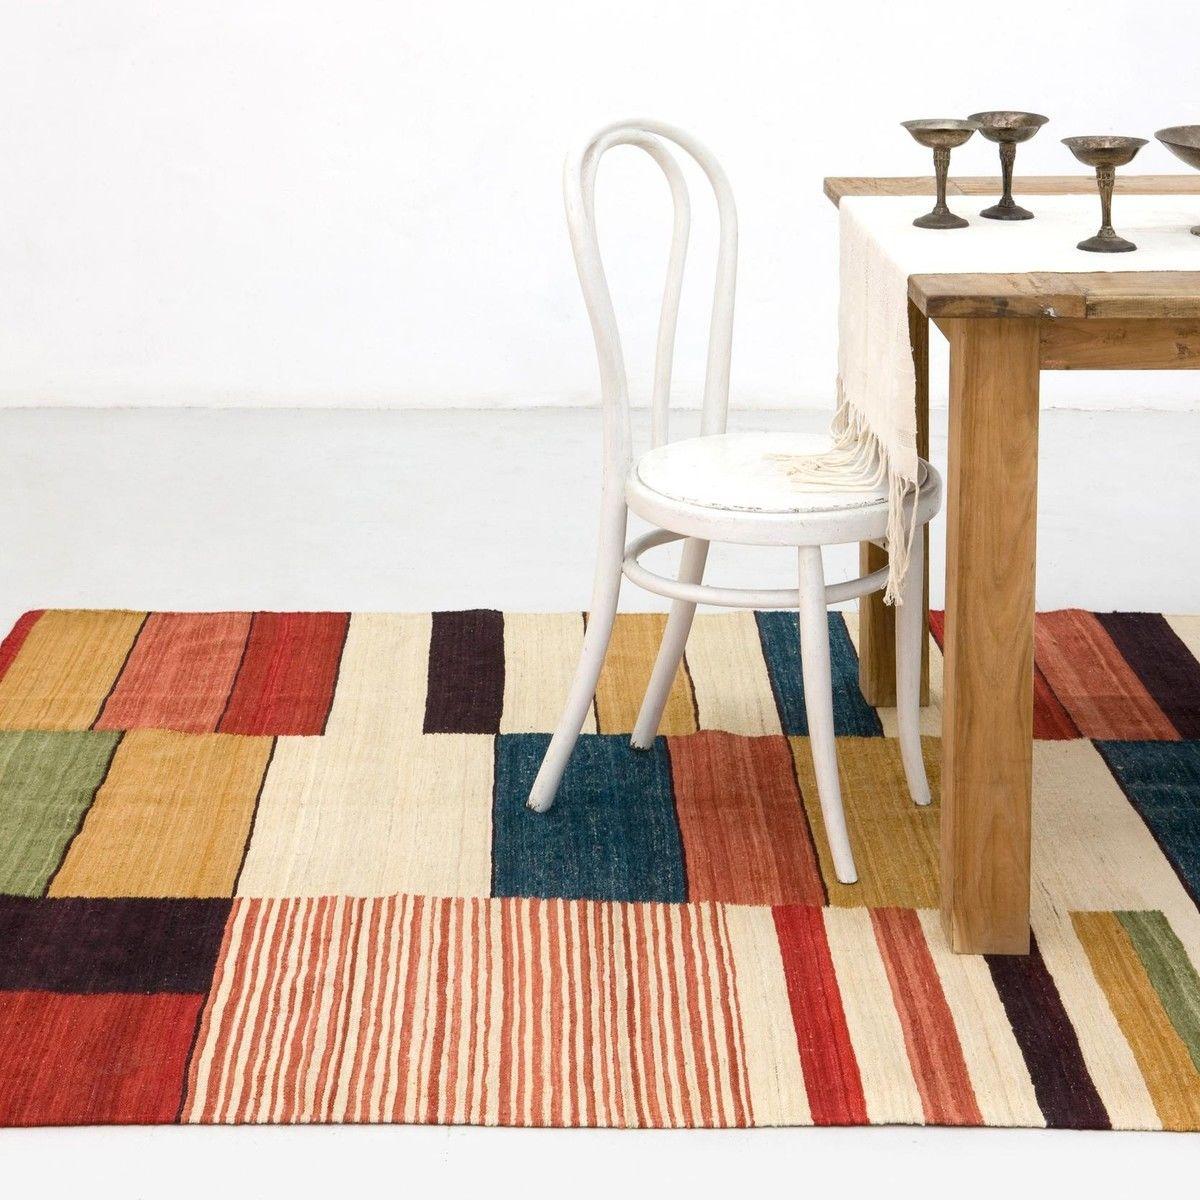 Nanimarquina Medina Wool Carpet Nanimarquina  : none1200x1200 ID1089245 f0d98c36f4b9f56637afab2db20de5d6 from www.ambientedirect.com size 1200 x 1200 jpeg 272kB